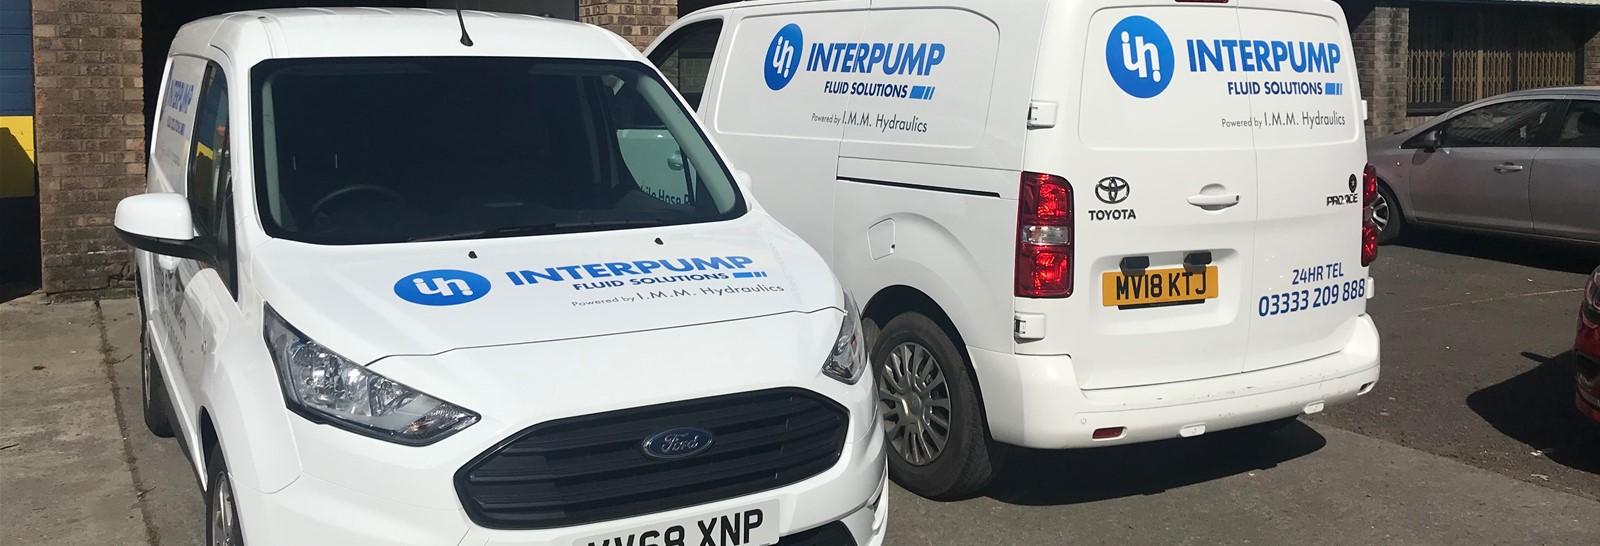 Fleet Livery for Interpump Hydraulics in Bristol